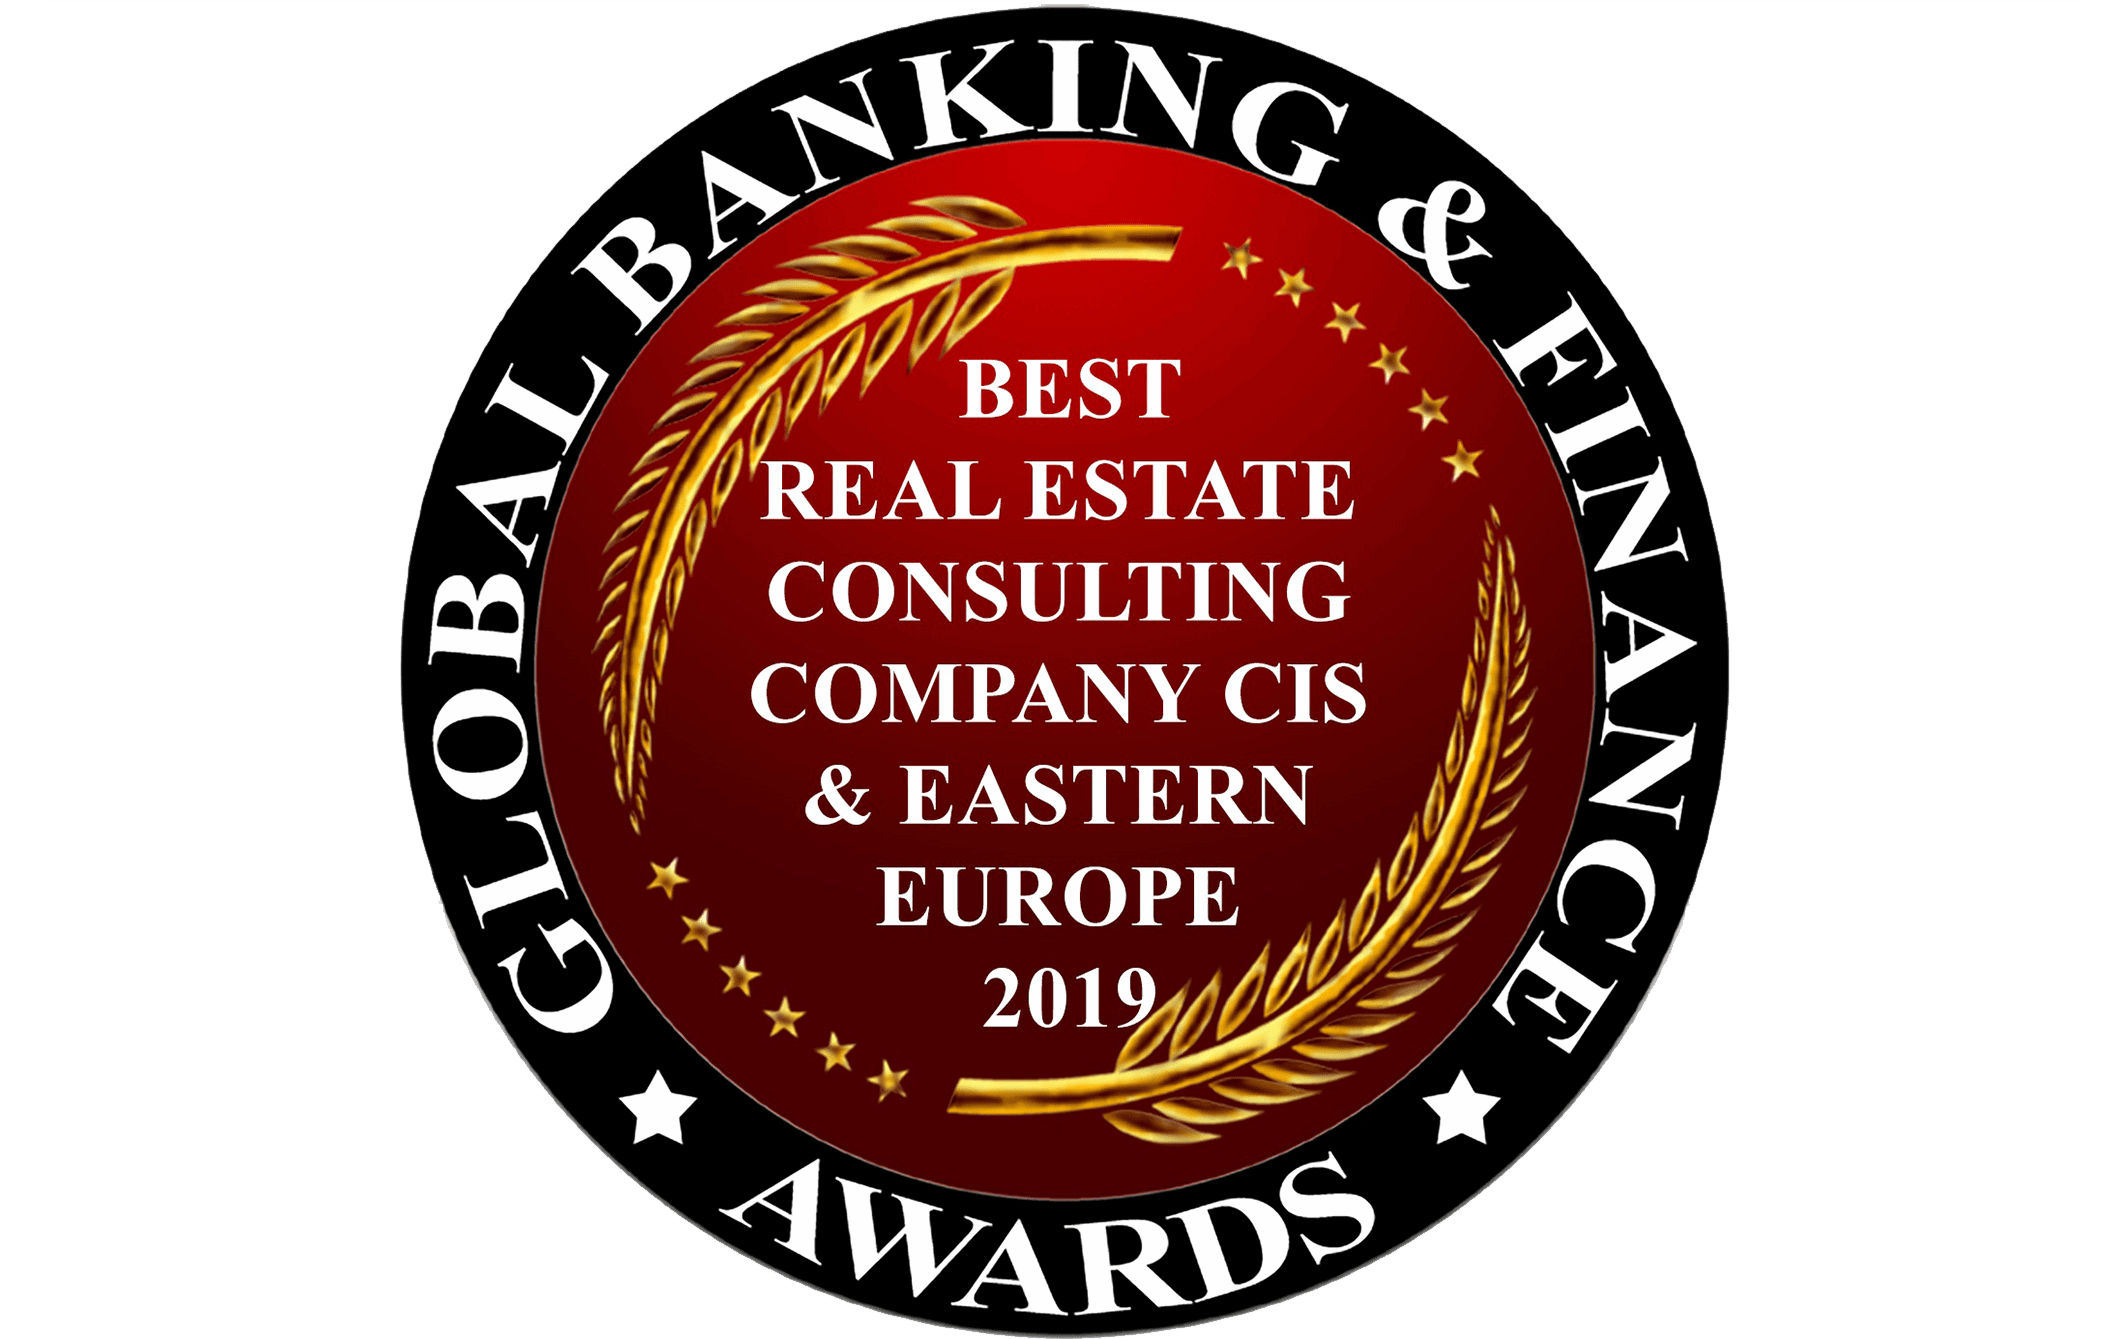 Global Banking & Finance Awards 2019